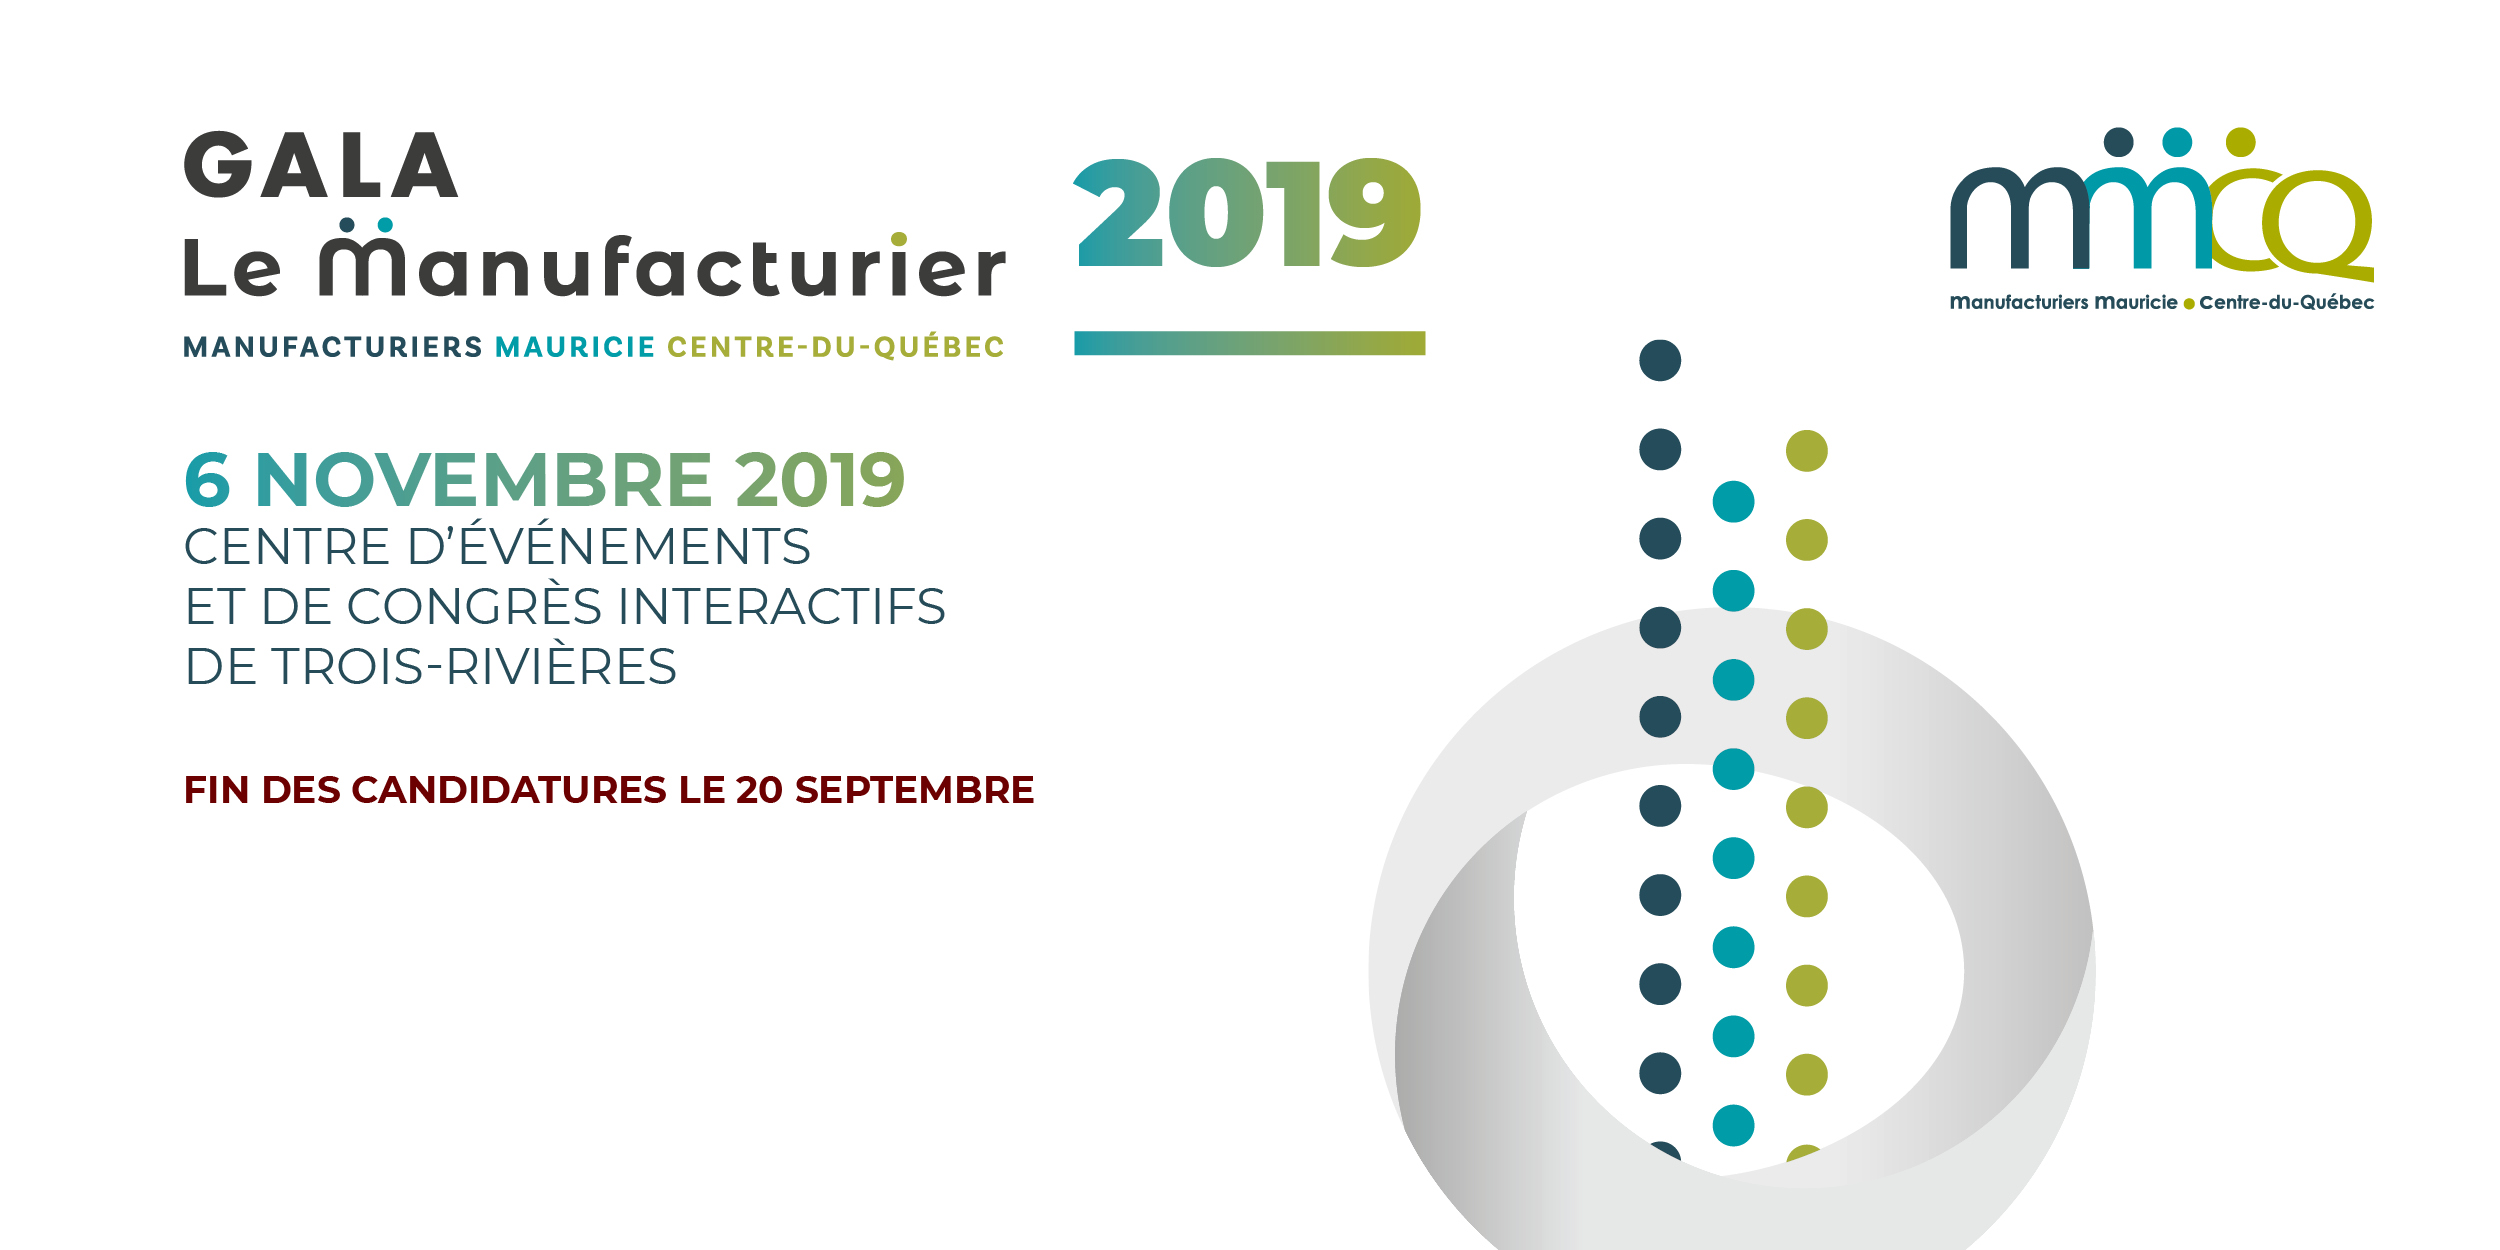 Gala Le Manufacturier 2019